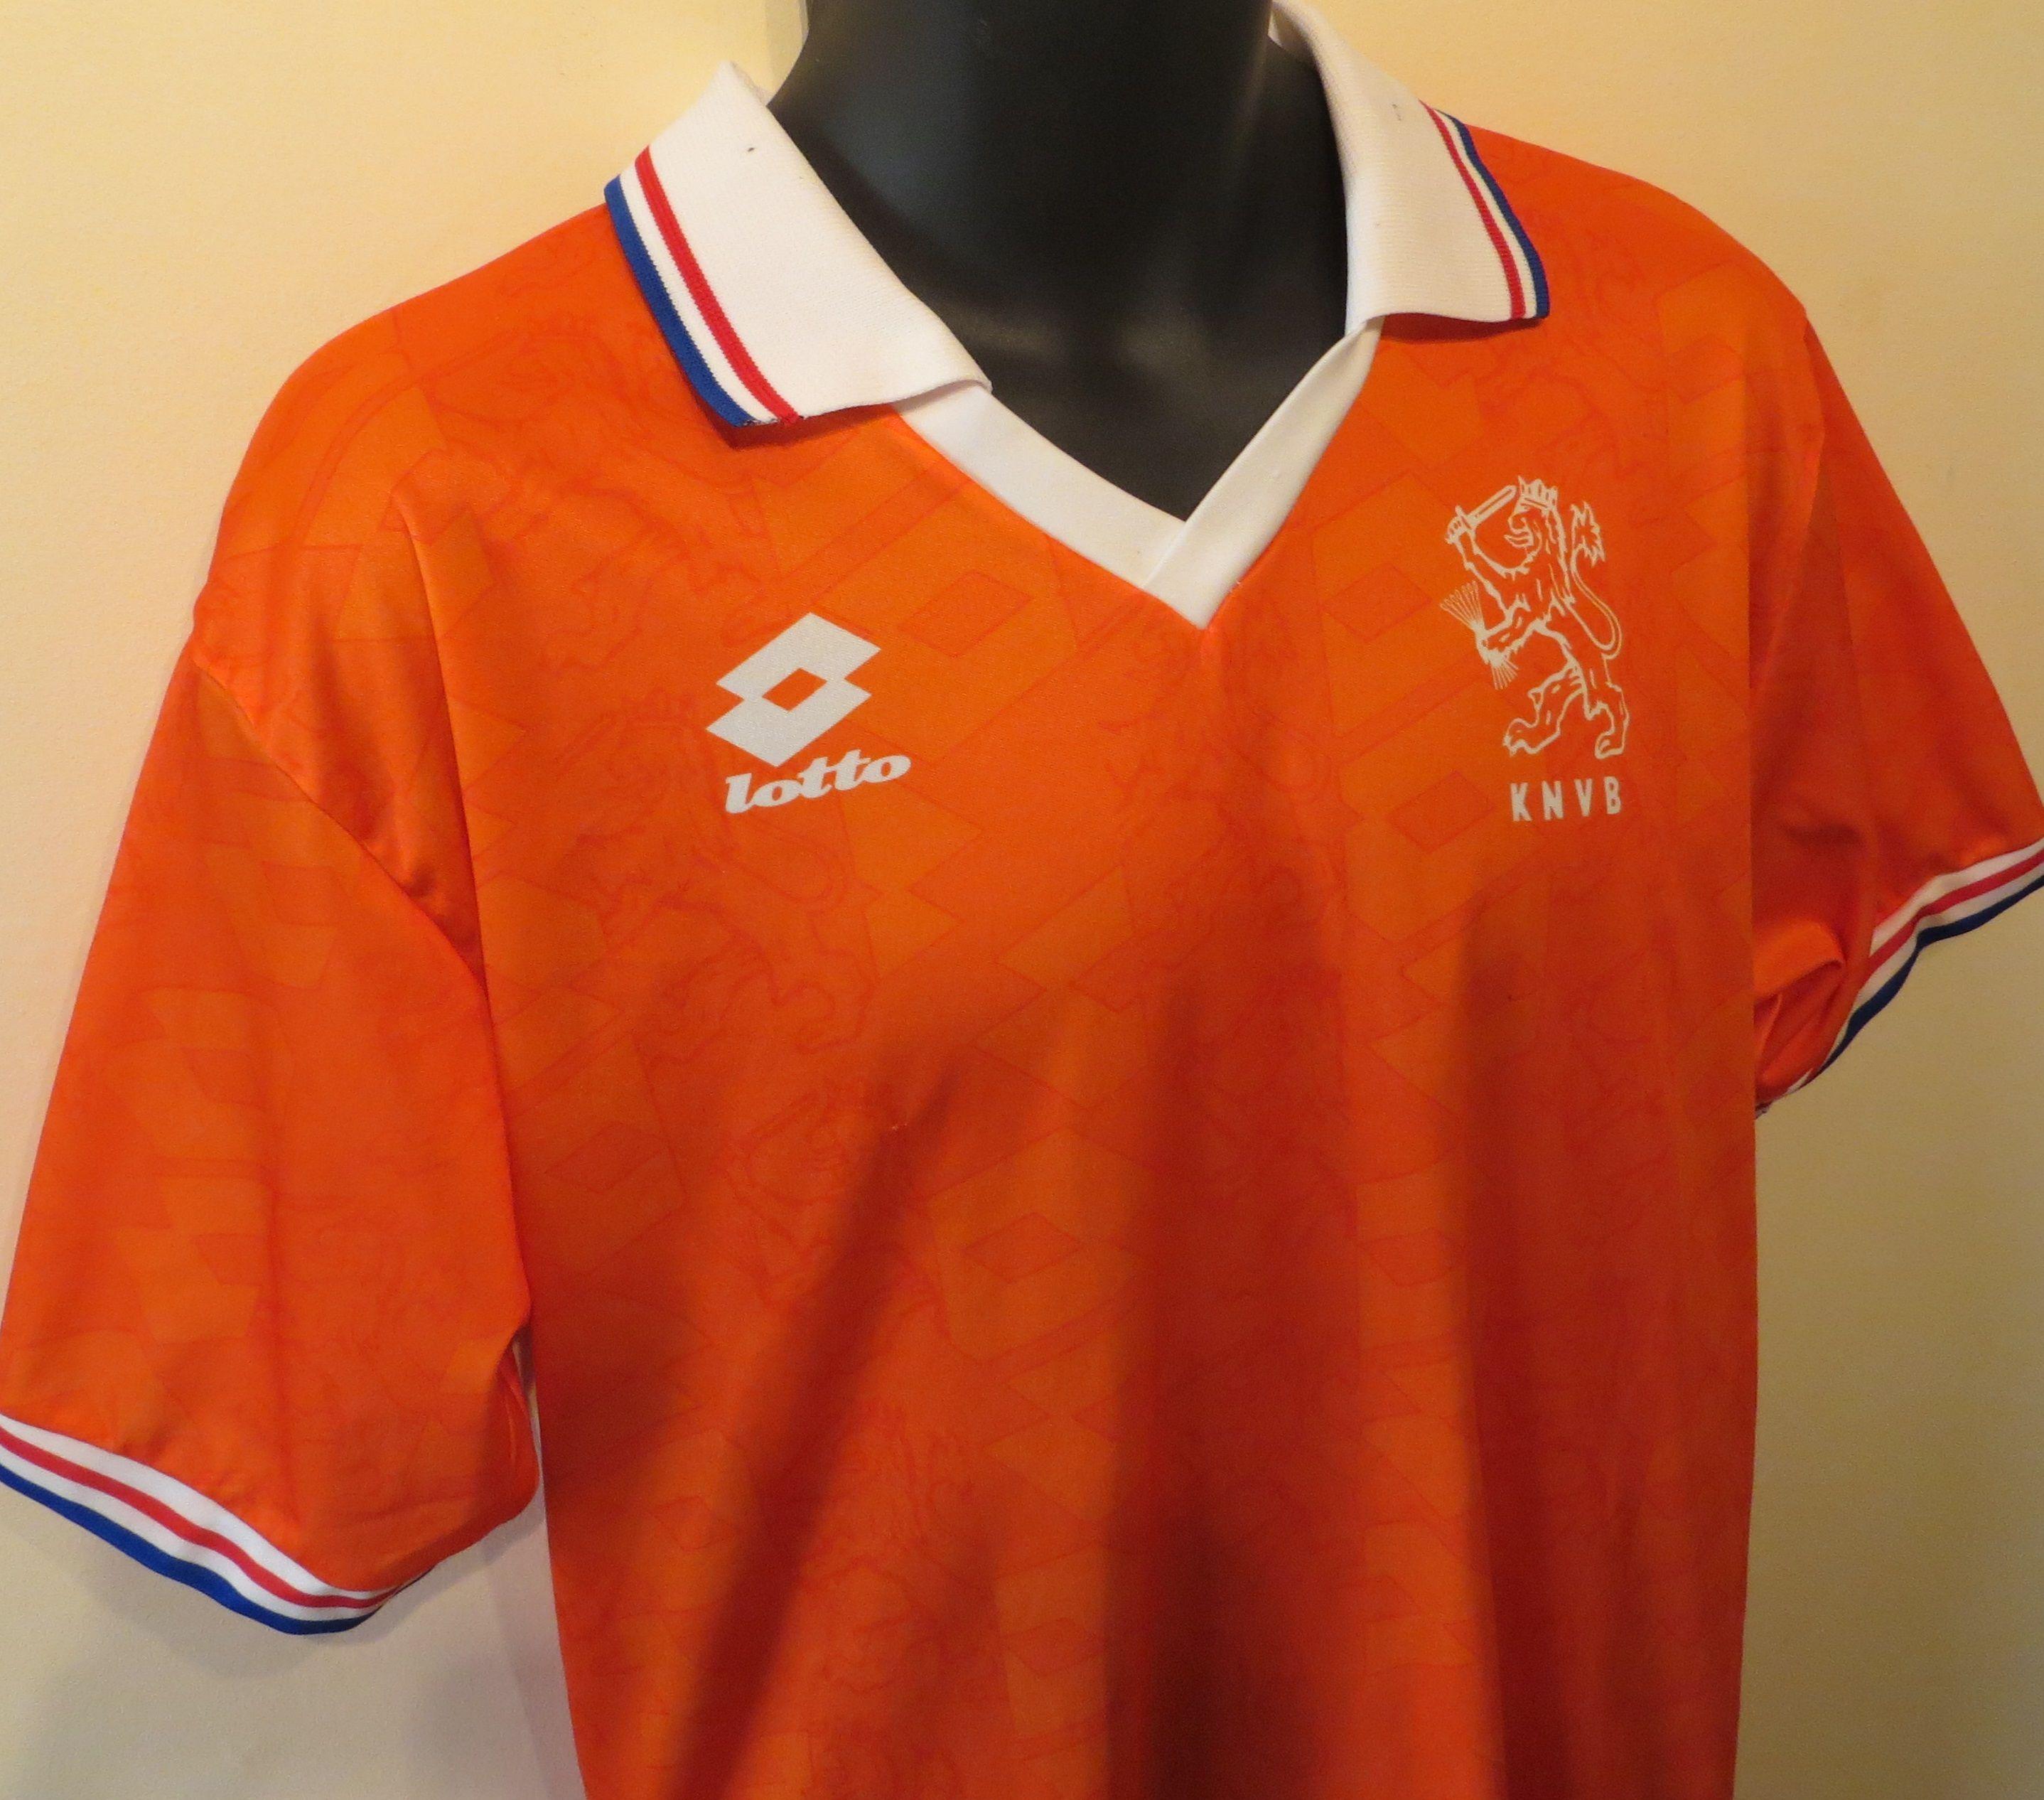 1994 Holland shirt by Lotto  a3b9d1e95